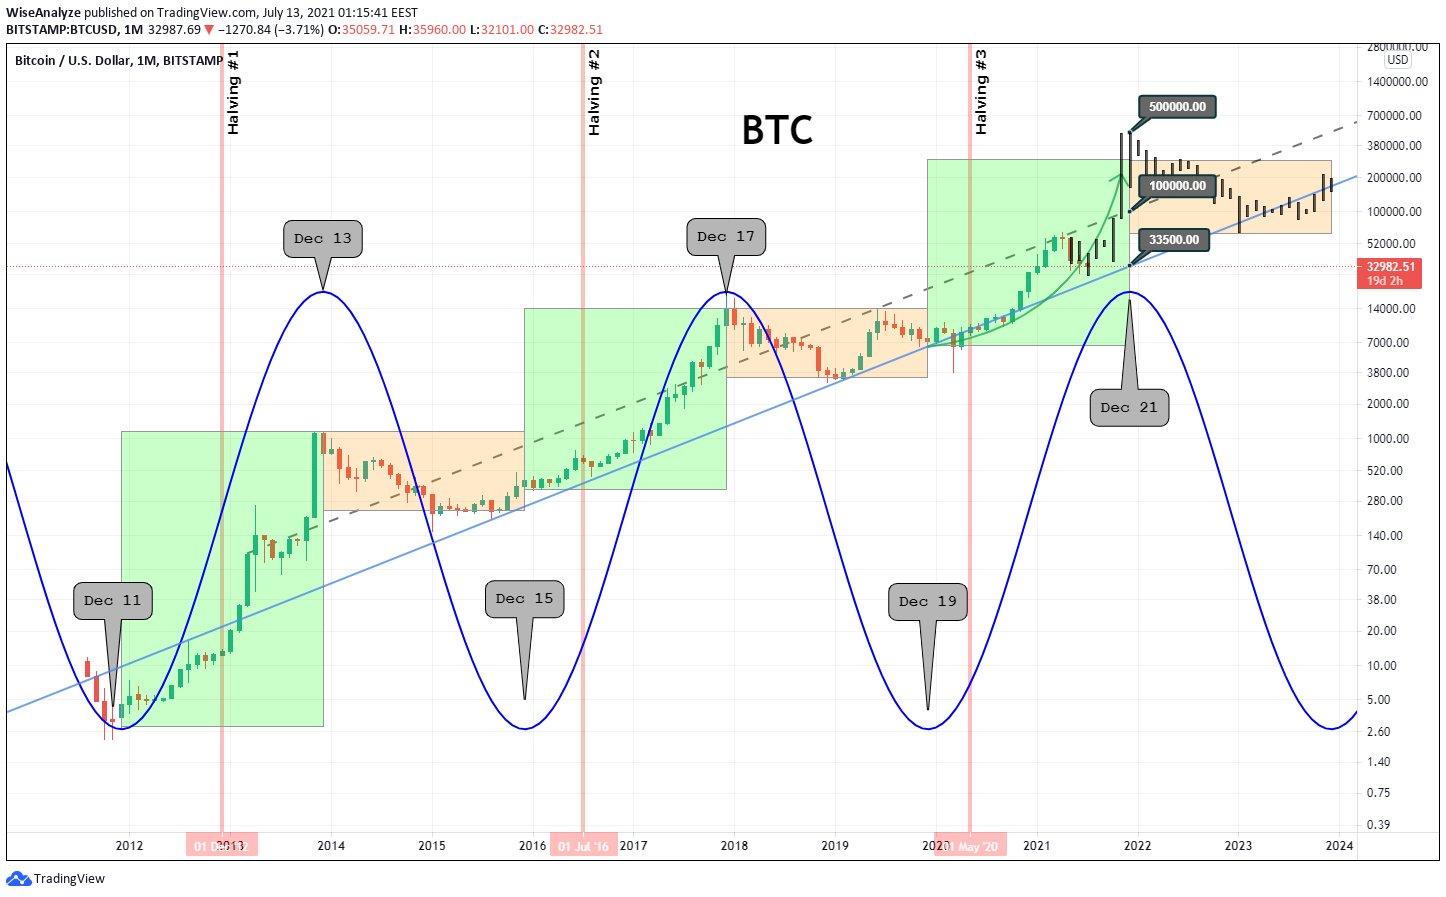 ¿Bitcoin subirá o bajará en diciembre de 2021?